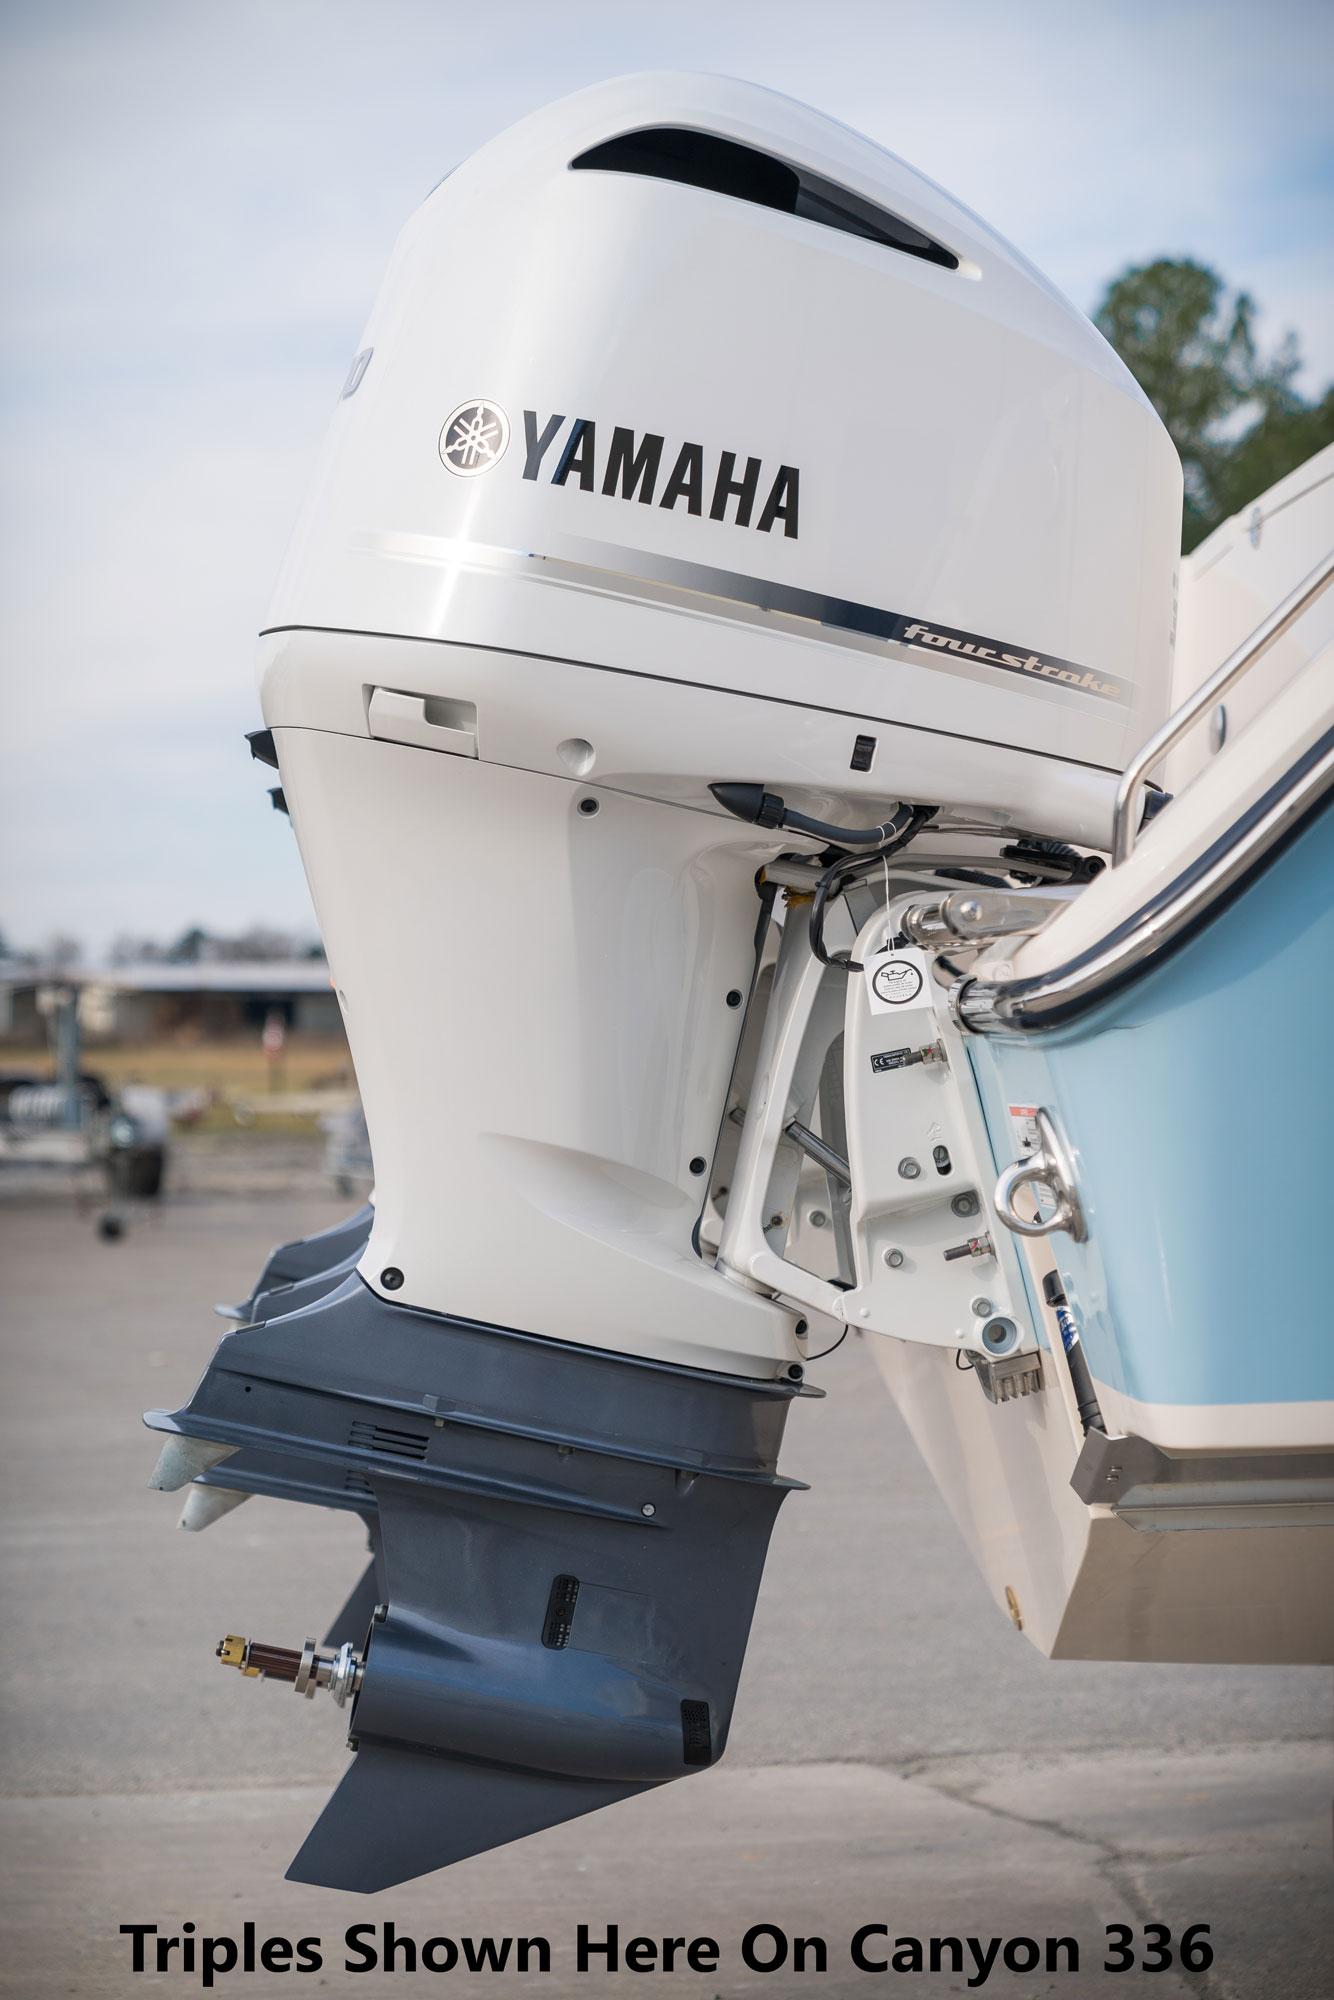 Grady-White Freedom 235 23-foot dual console white Yamaha engines